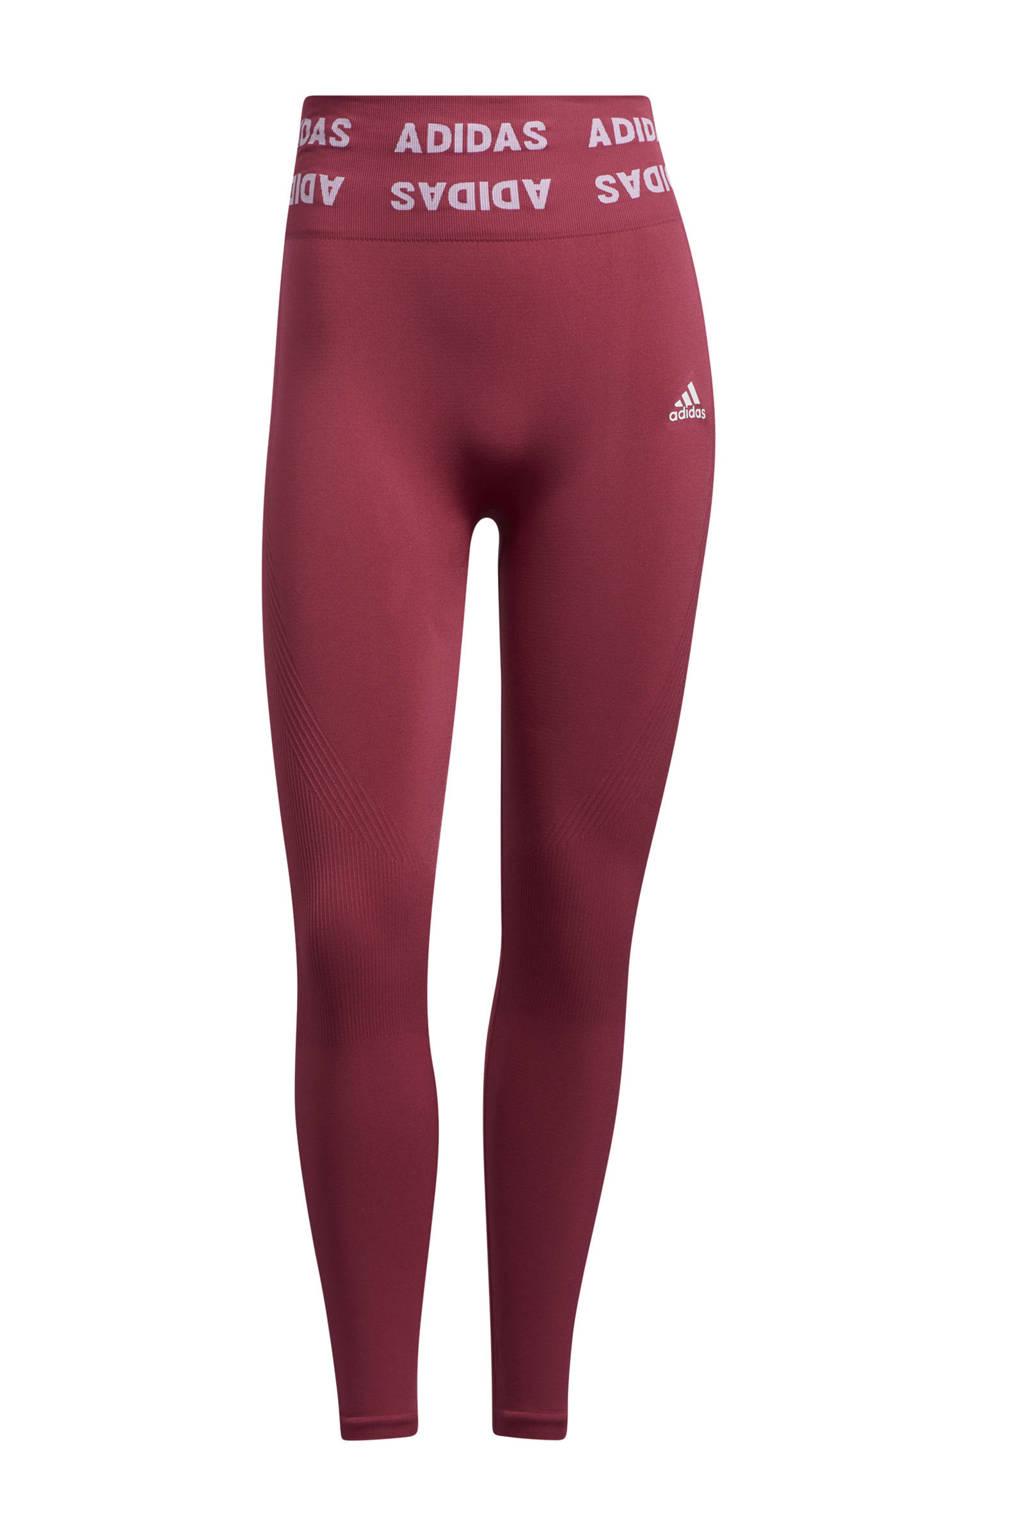 adidas Performance Aeroknit Designed4Training sportlegging roze, Roze